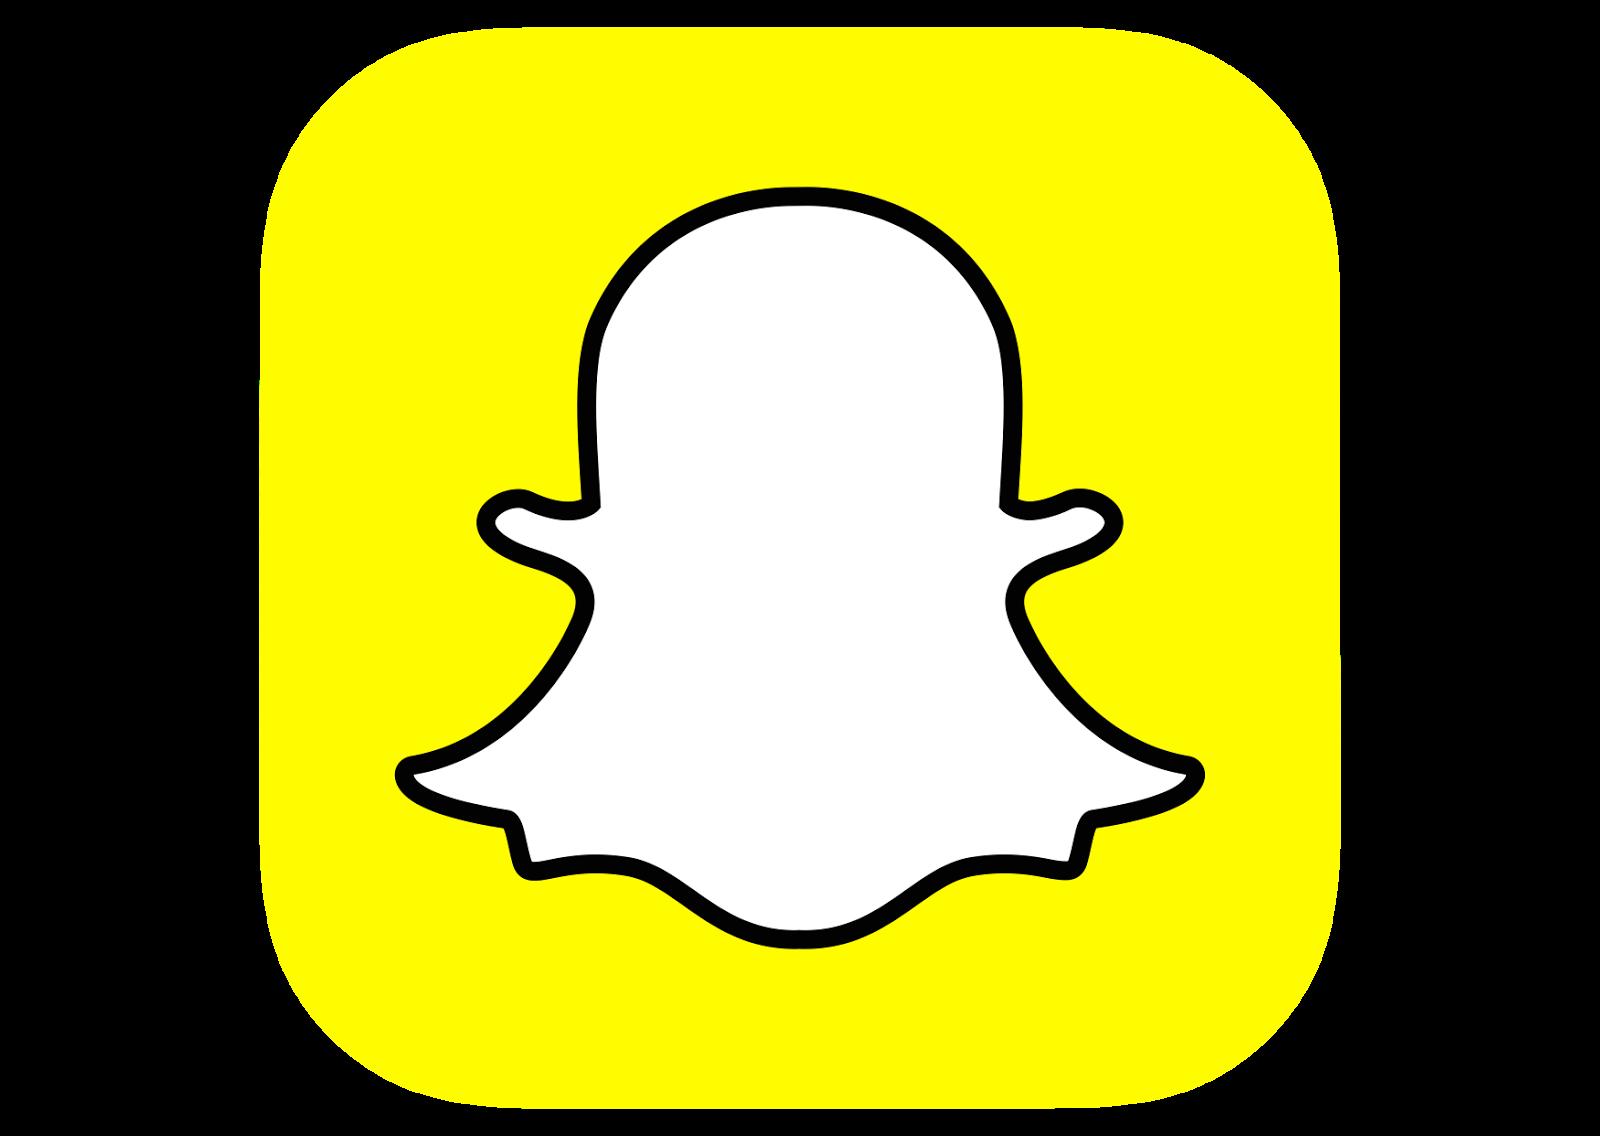 Snapchat Logo Clipart-Snapchat Logo Clipart-2